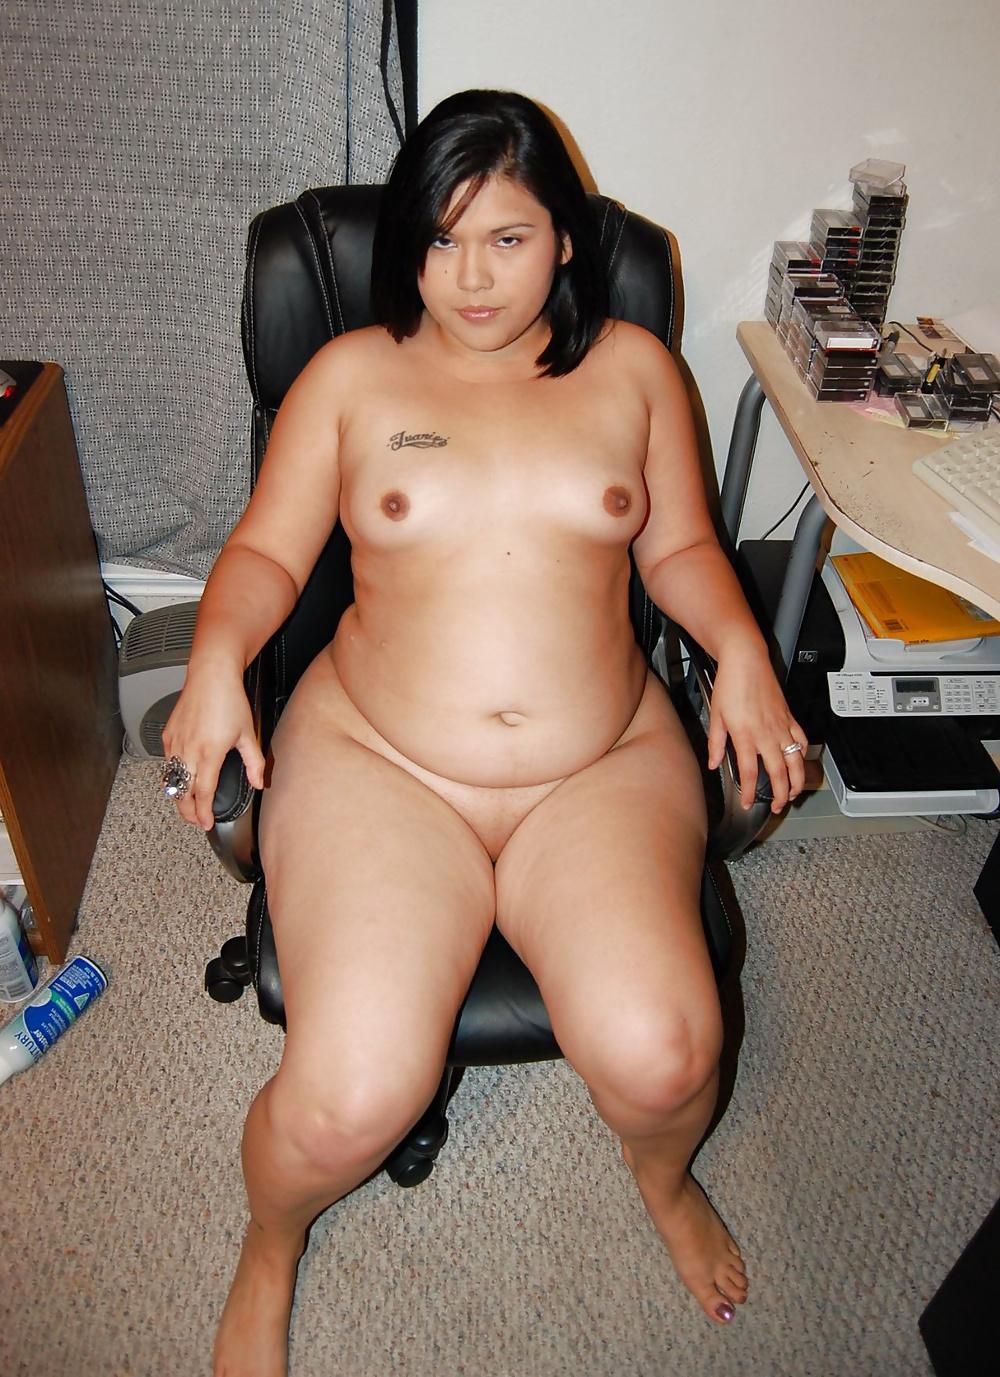 hardcore-movies-short-girl-fat-pic-nude-com-maite-perroni